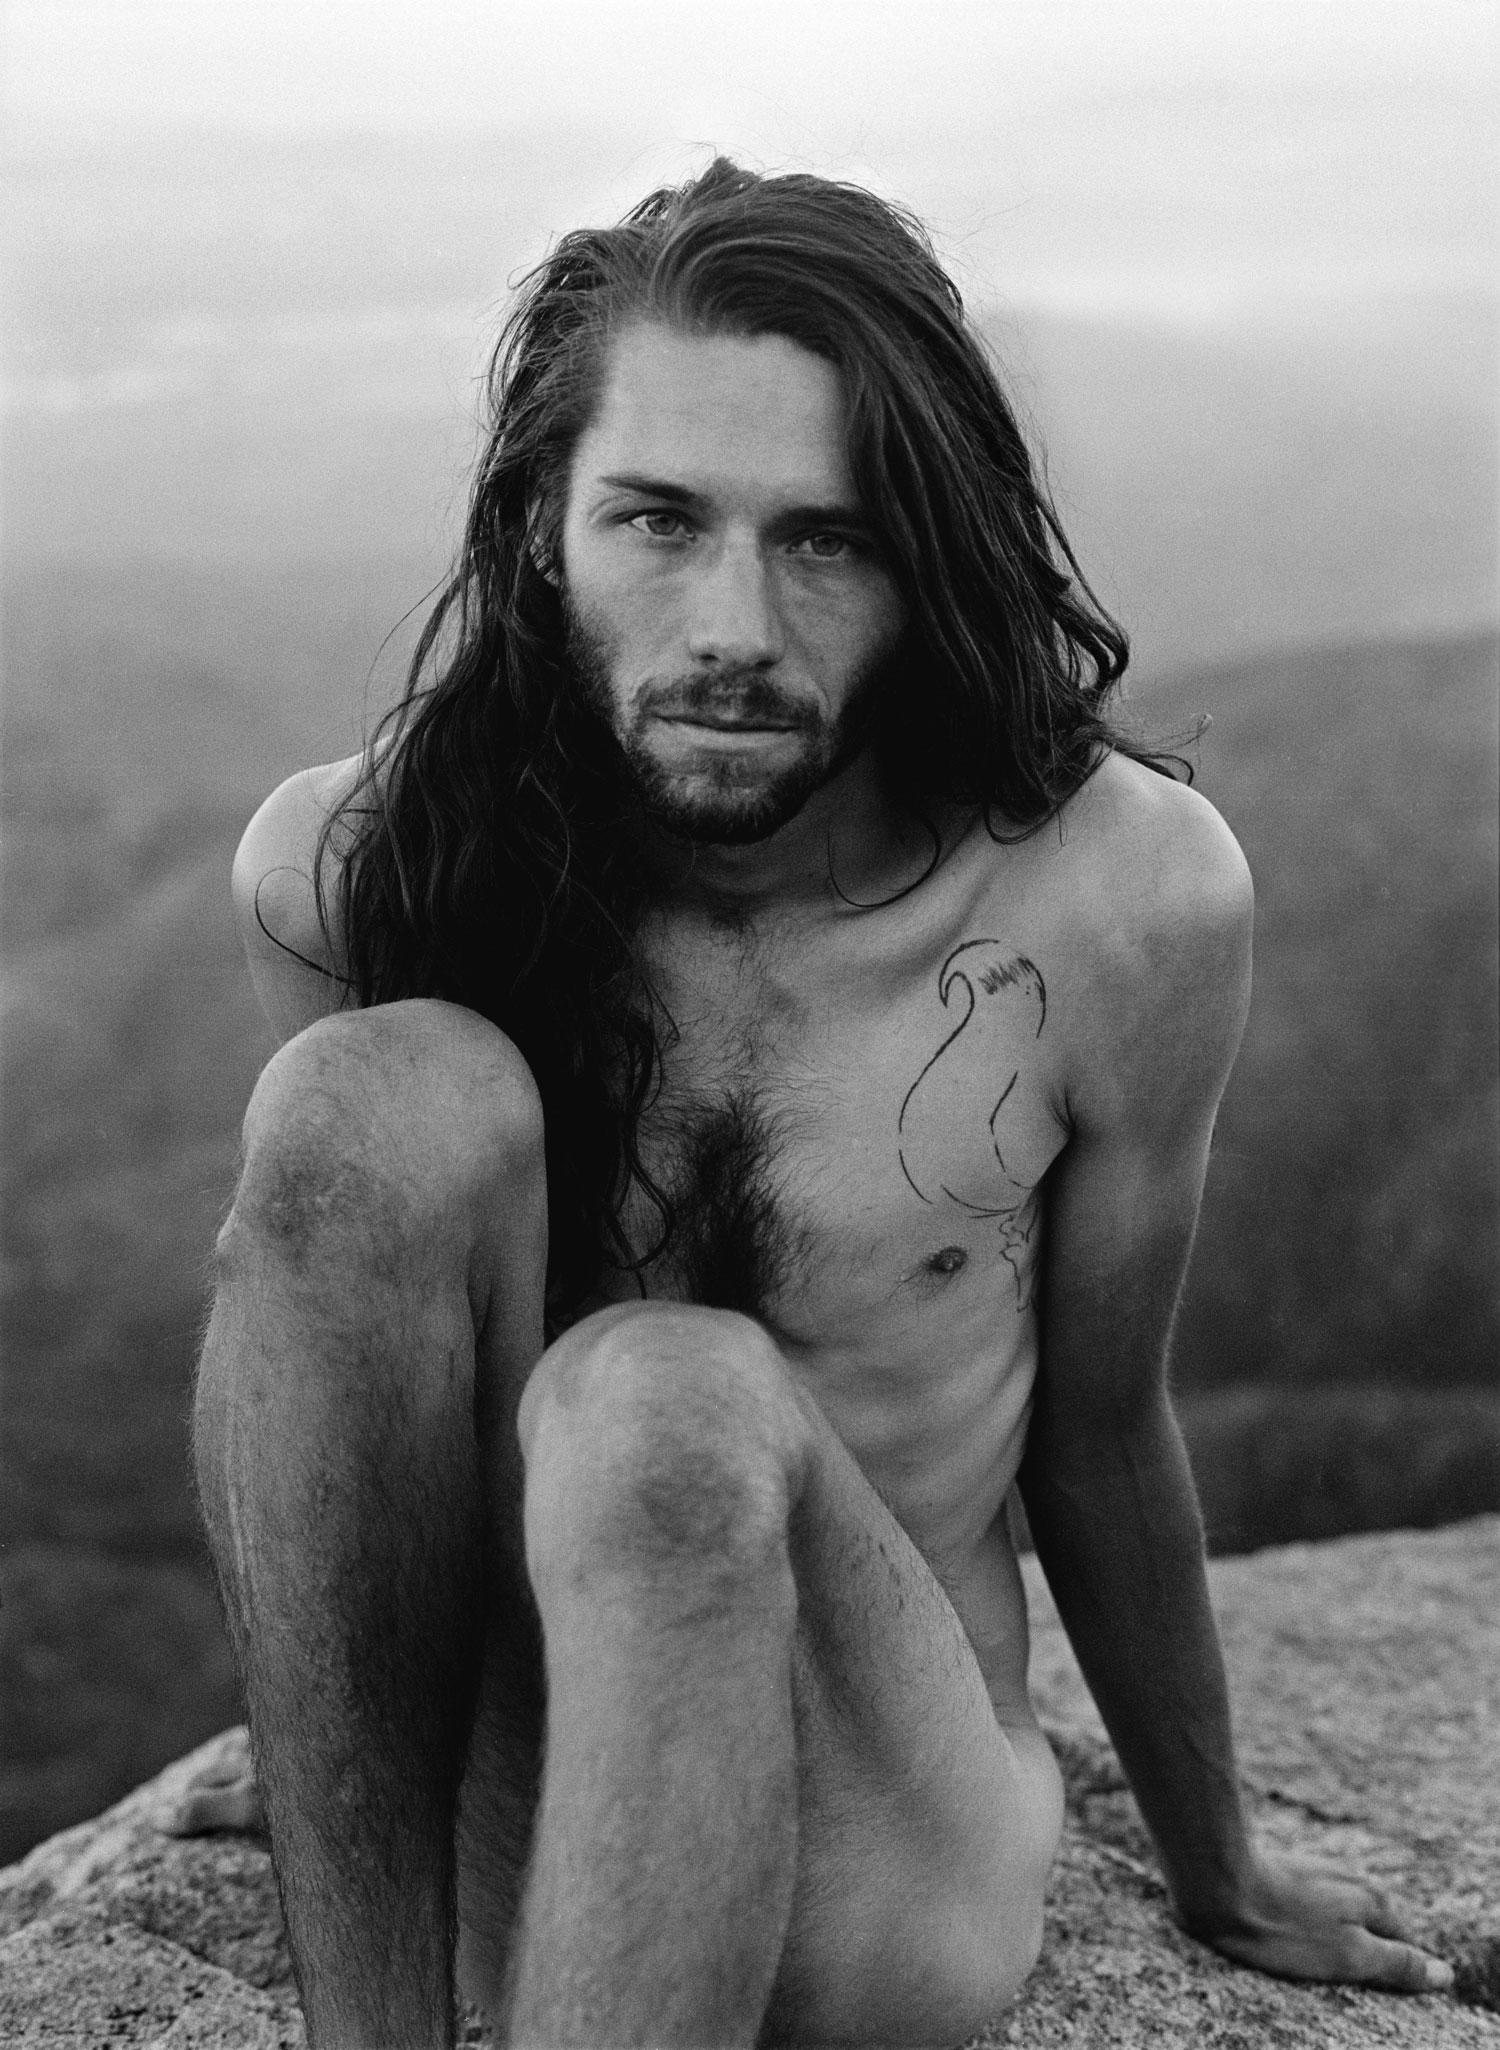 aaron-naked-portrait.jpg